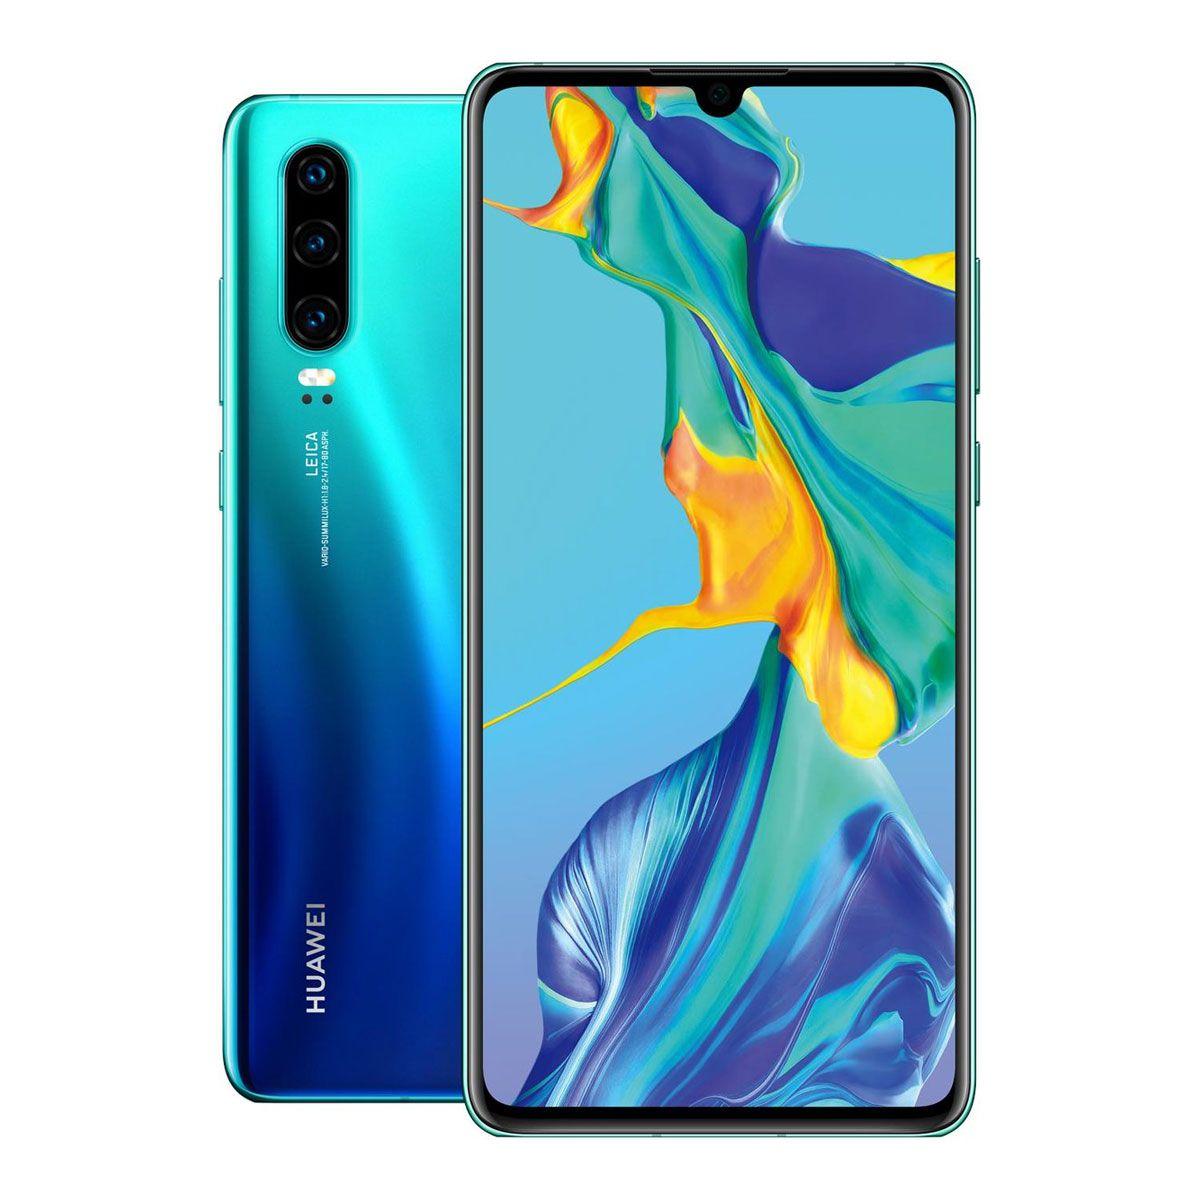 Huawei P30 Price in Pakistan 2020 | PriceOye